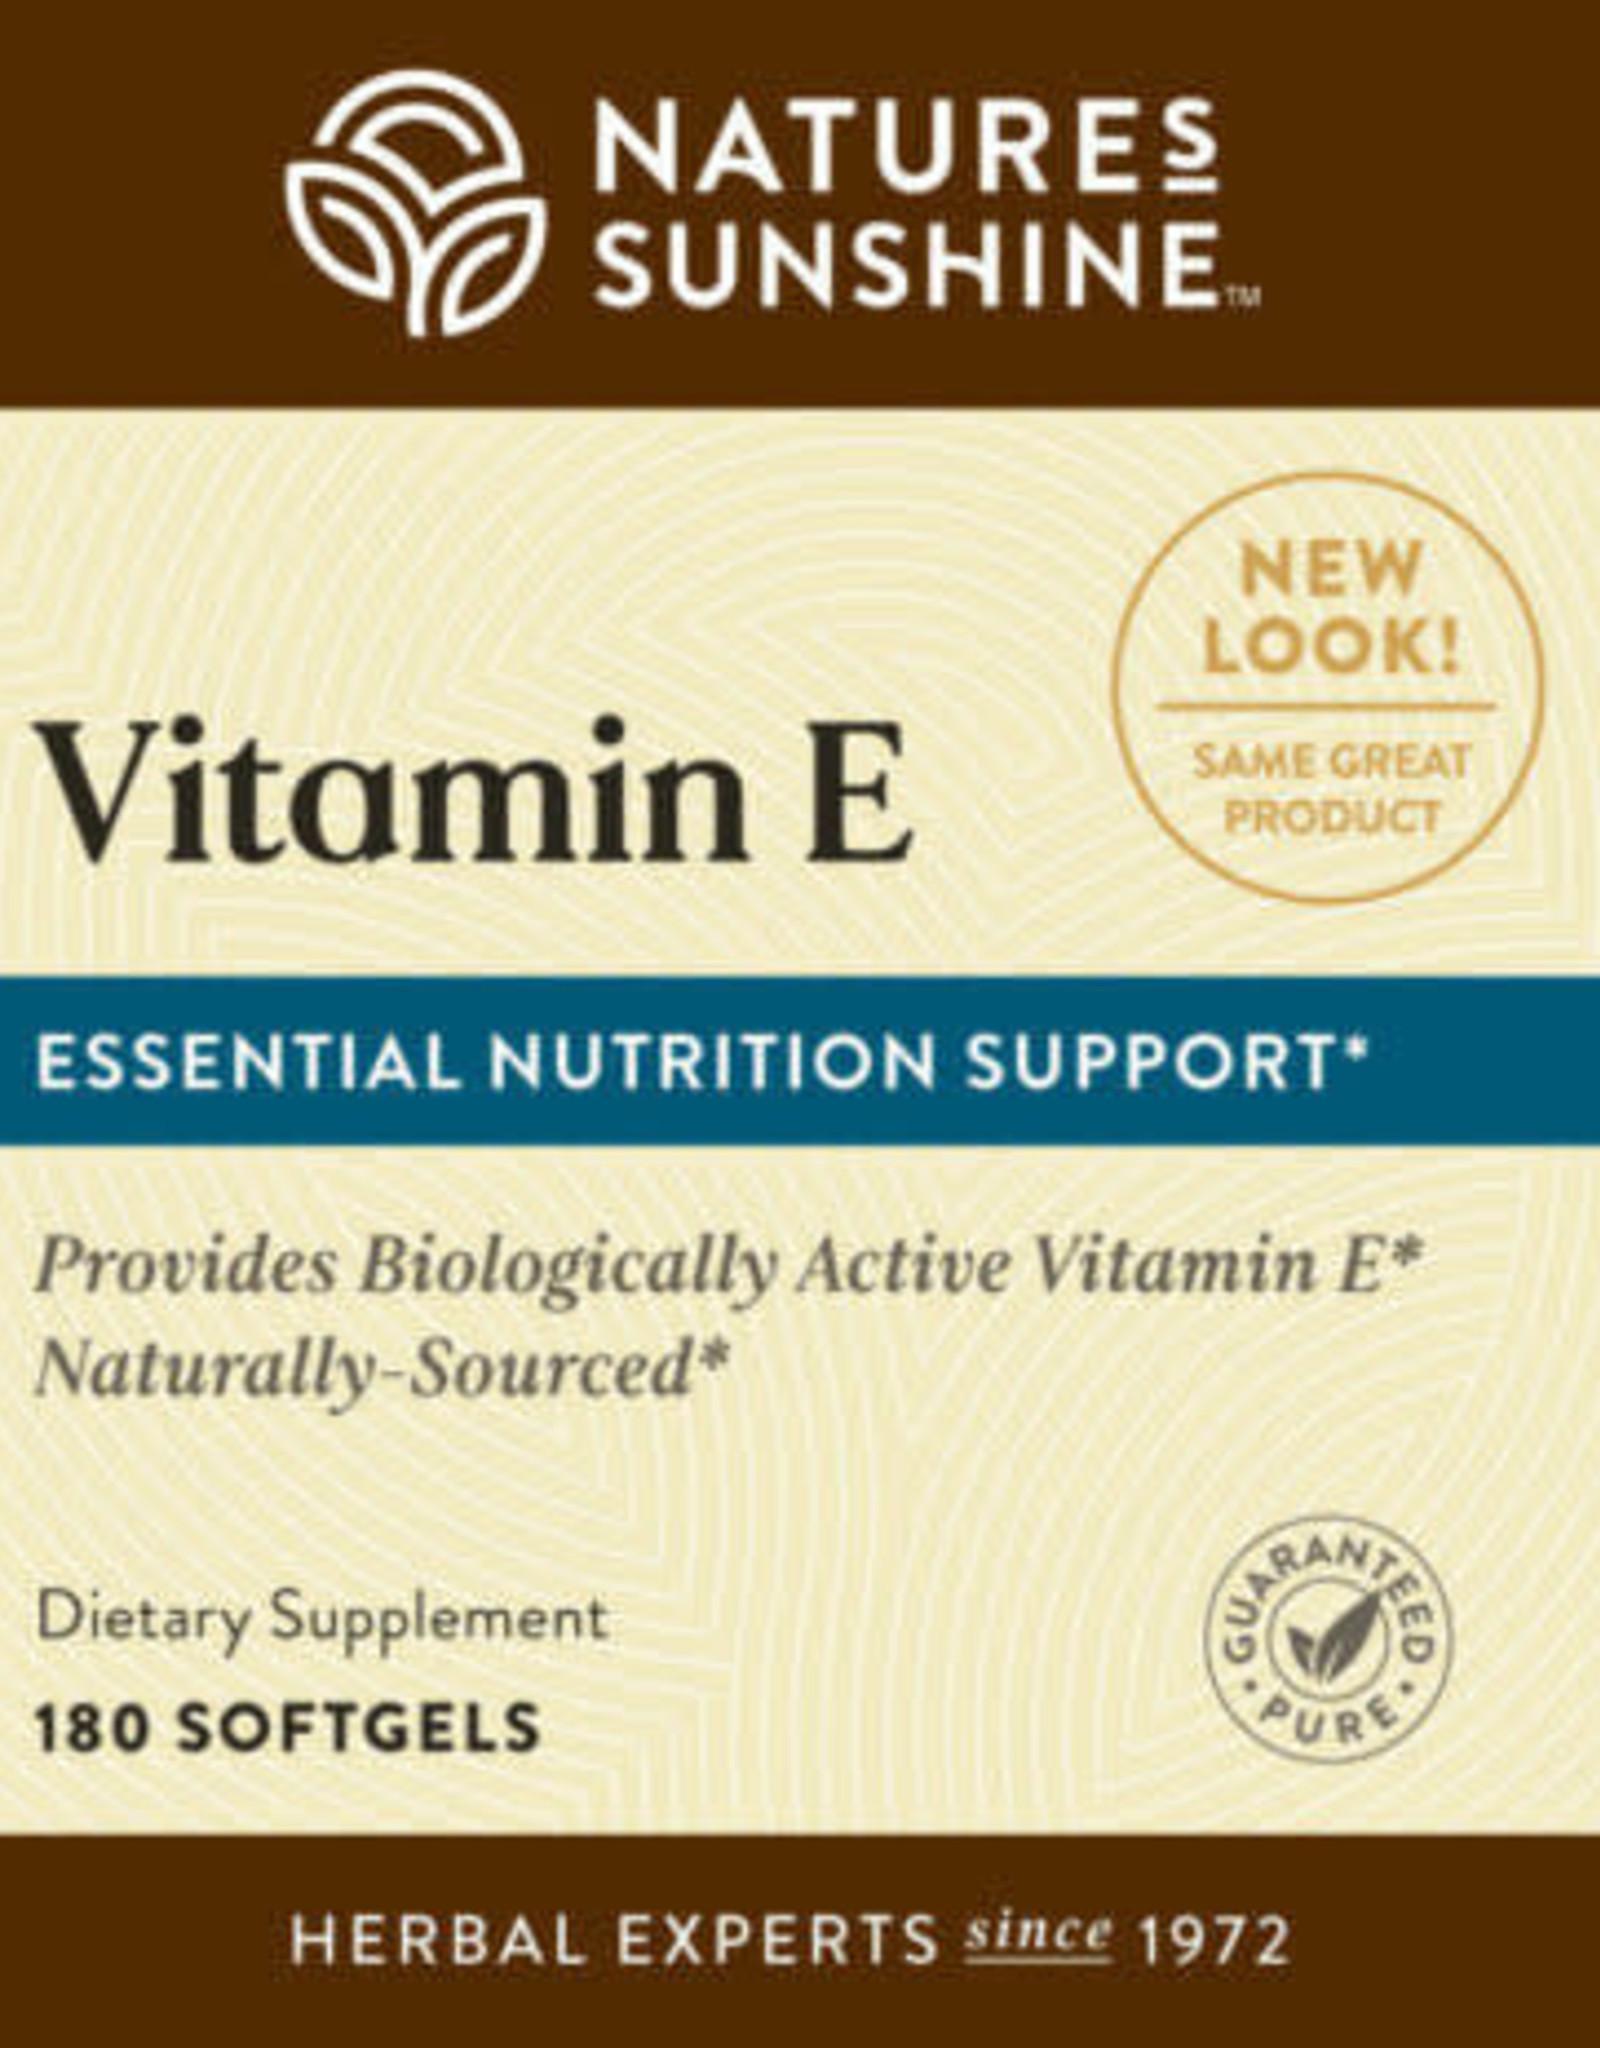 Nature's Sunshine Vitamin E Complete w/ Selenium (60 softgel caps)